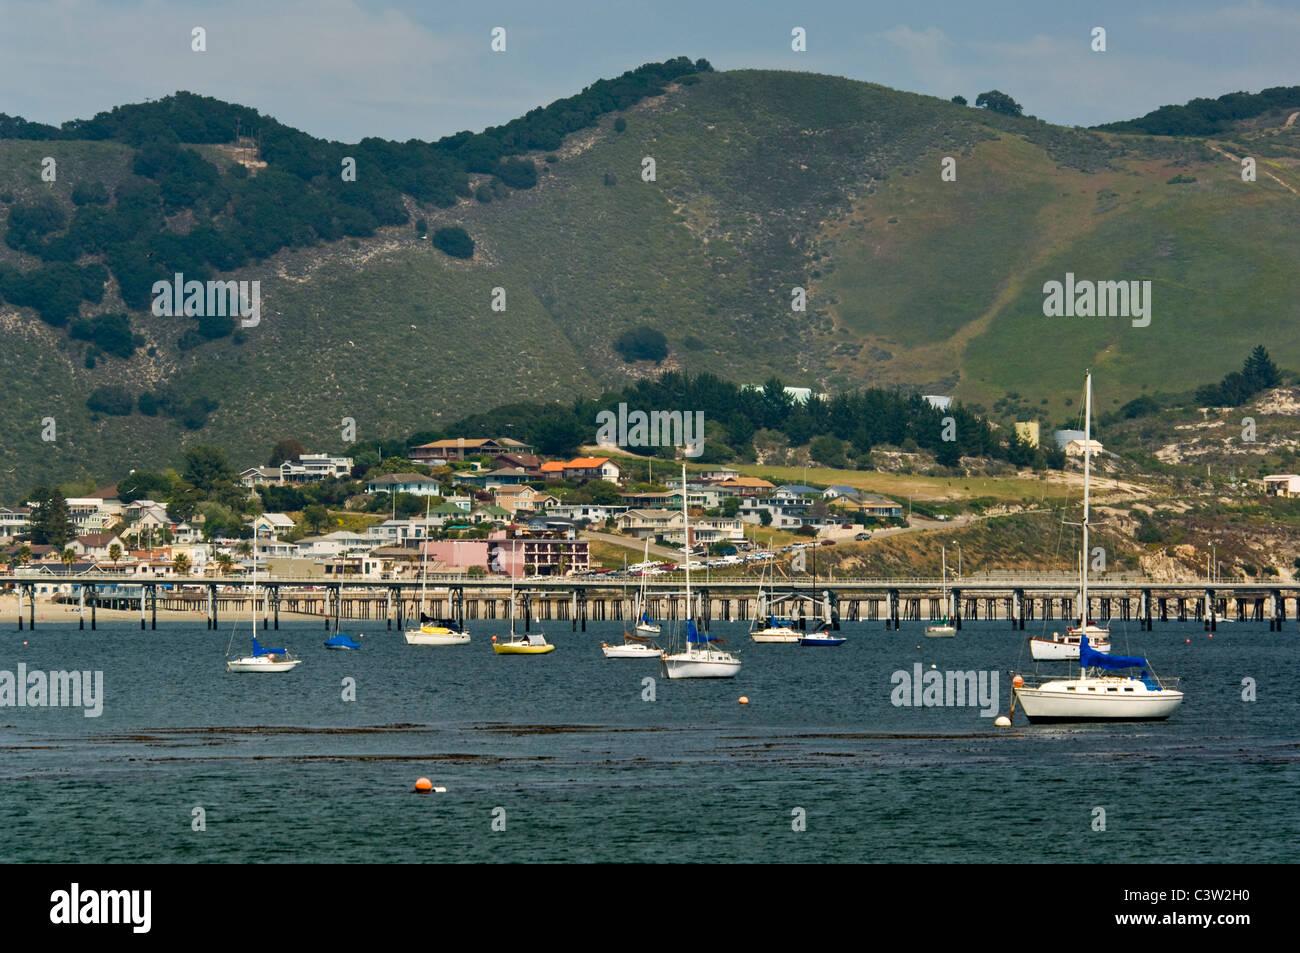 Boats anchored in San Luis Obispo Bay, near Avila Beach, California - Stock Image